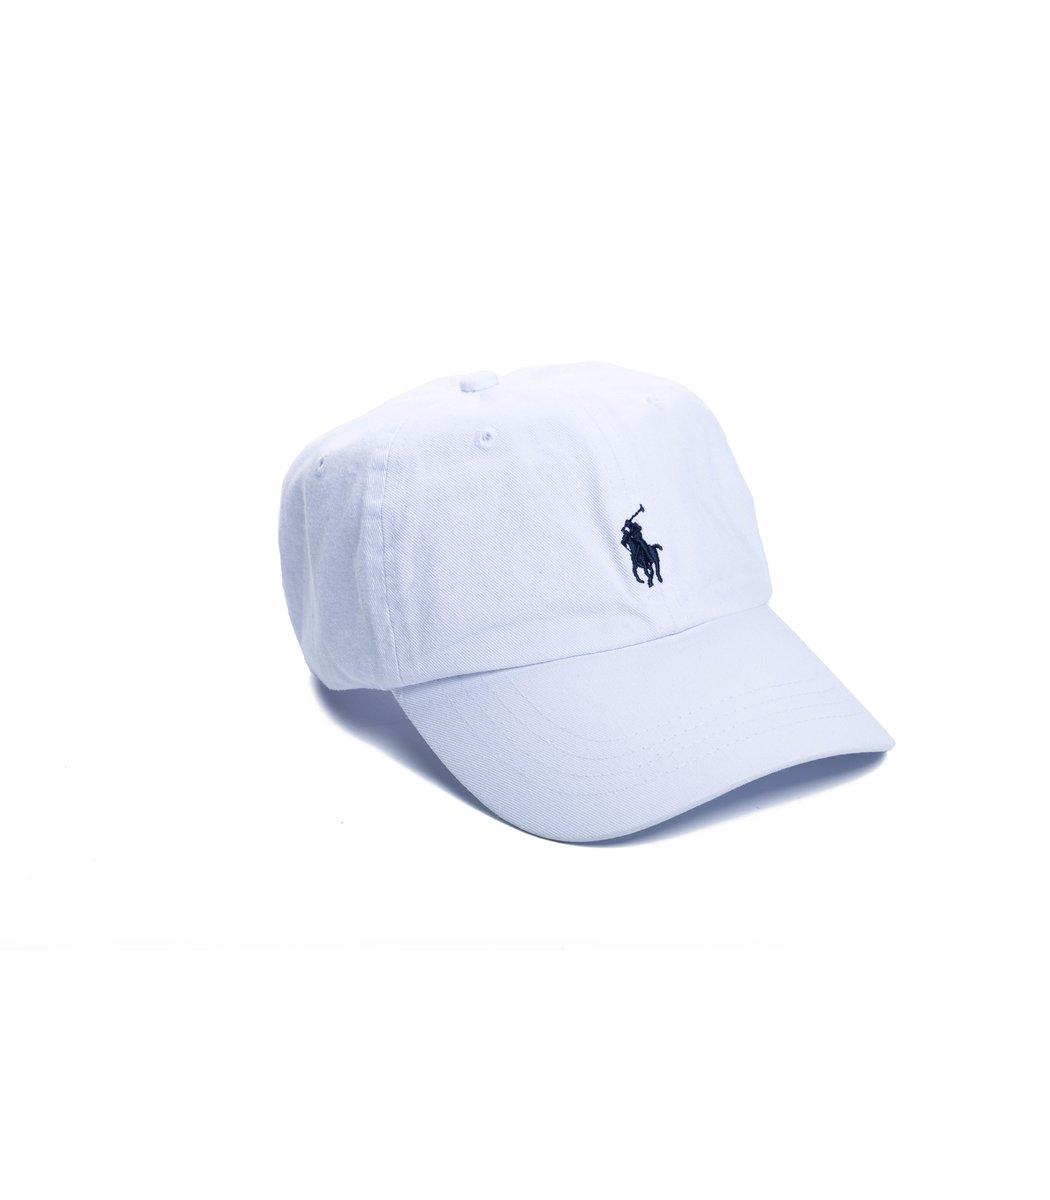 Кепка POLO Ralph Lauren Small logo Белый/черный